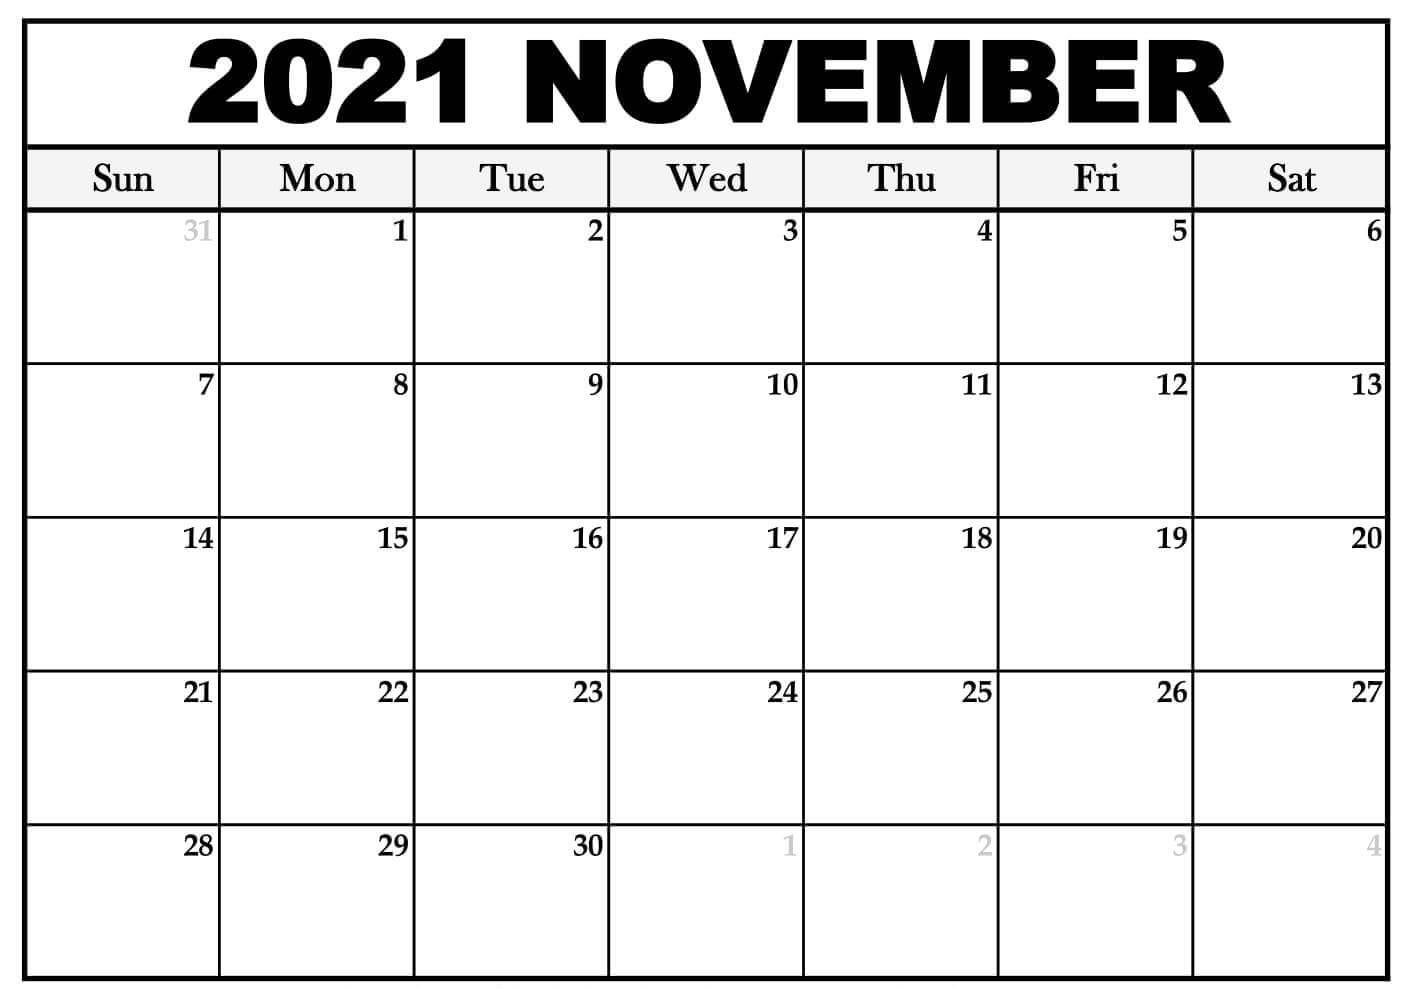 November Calendar 2021 Template